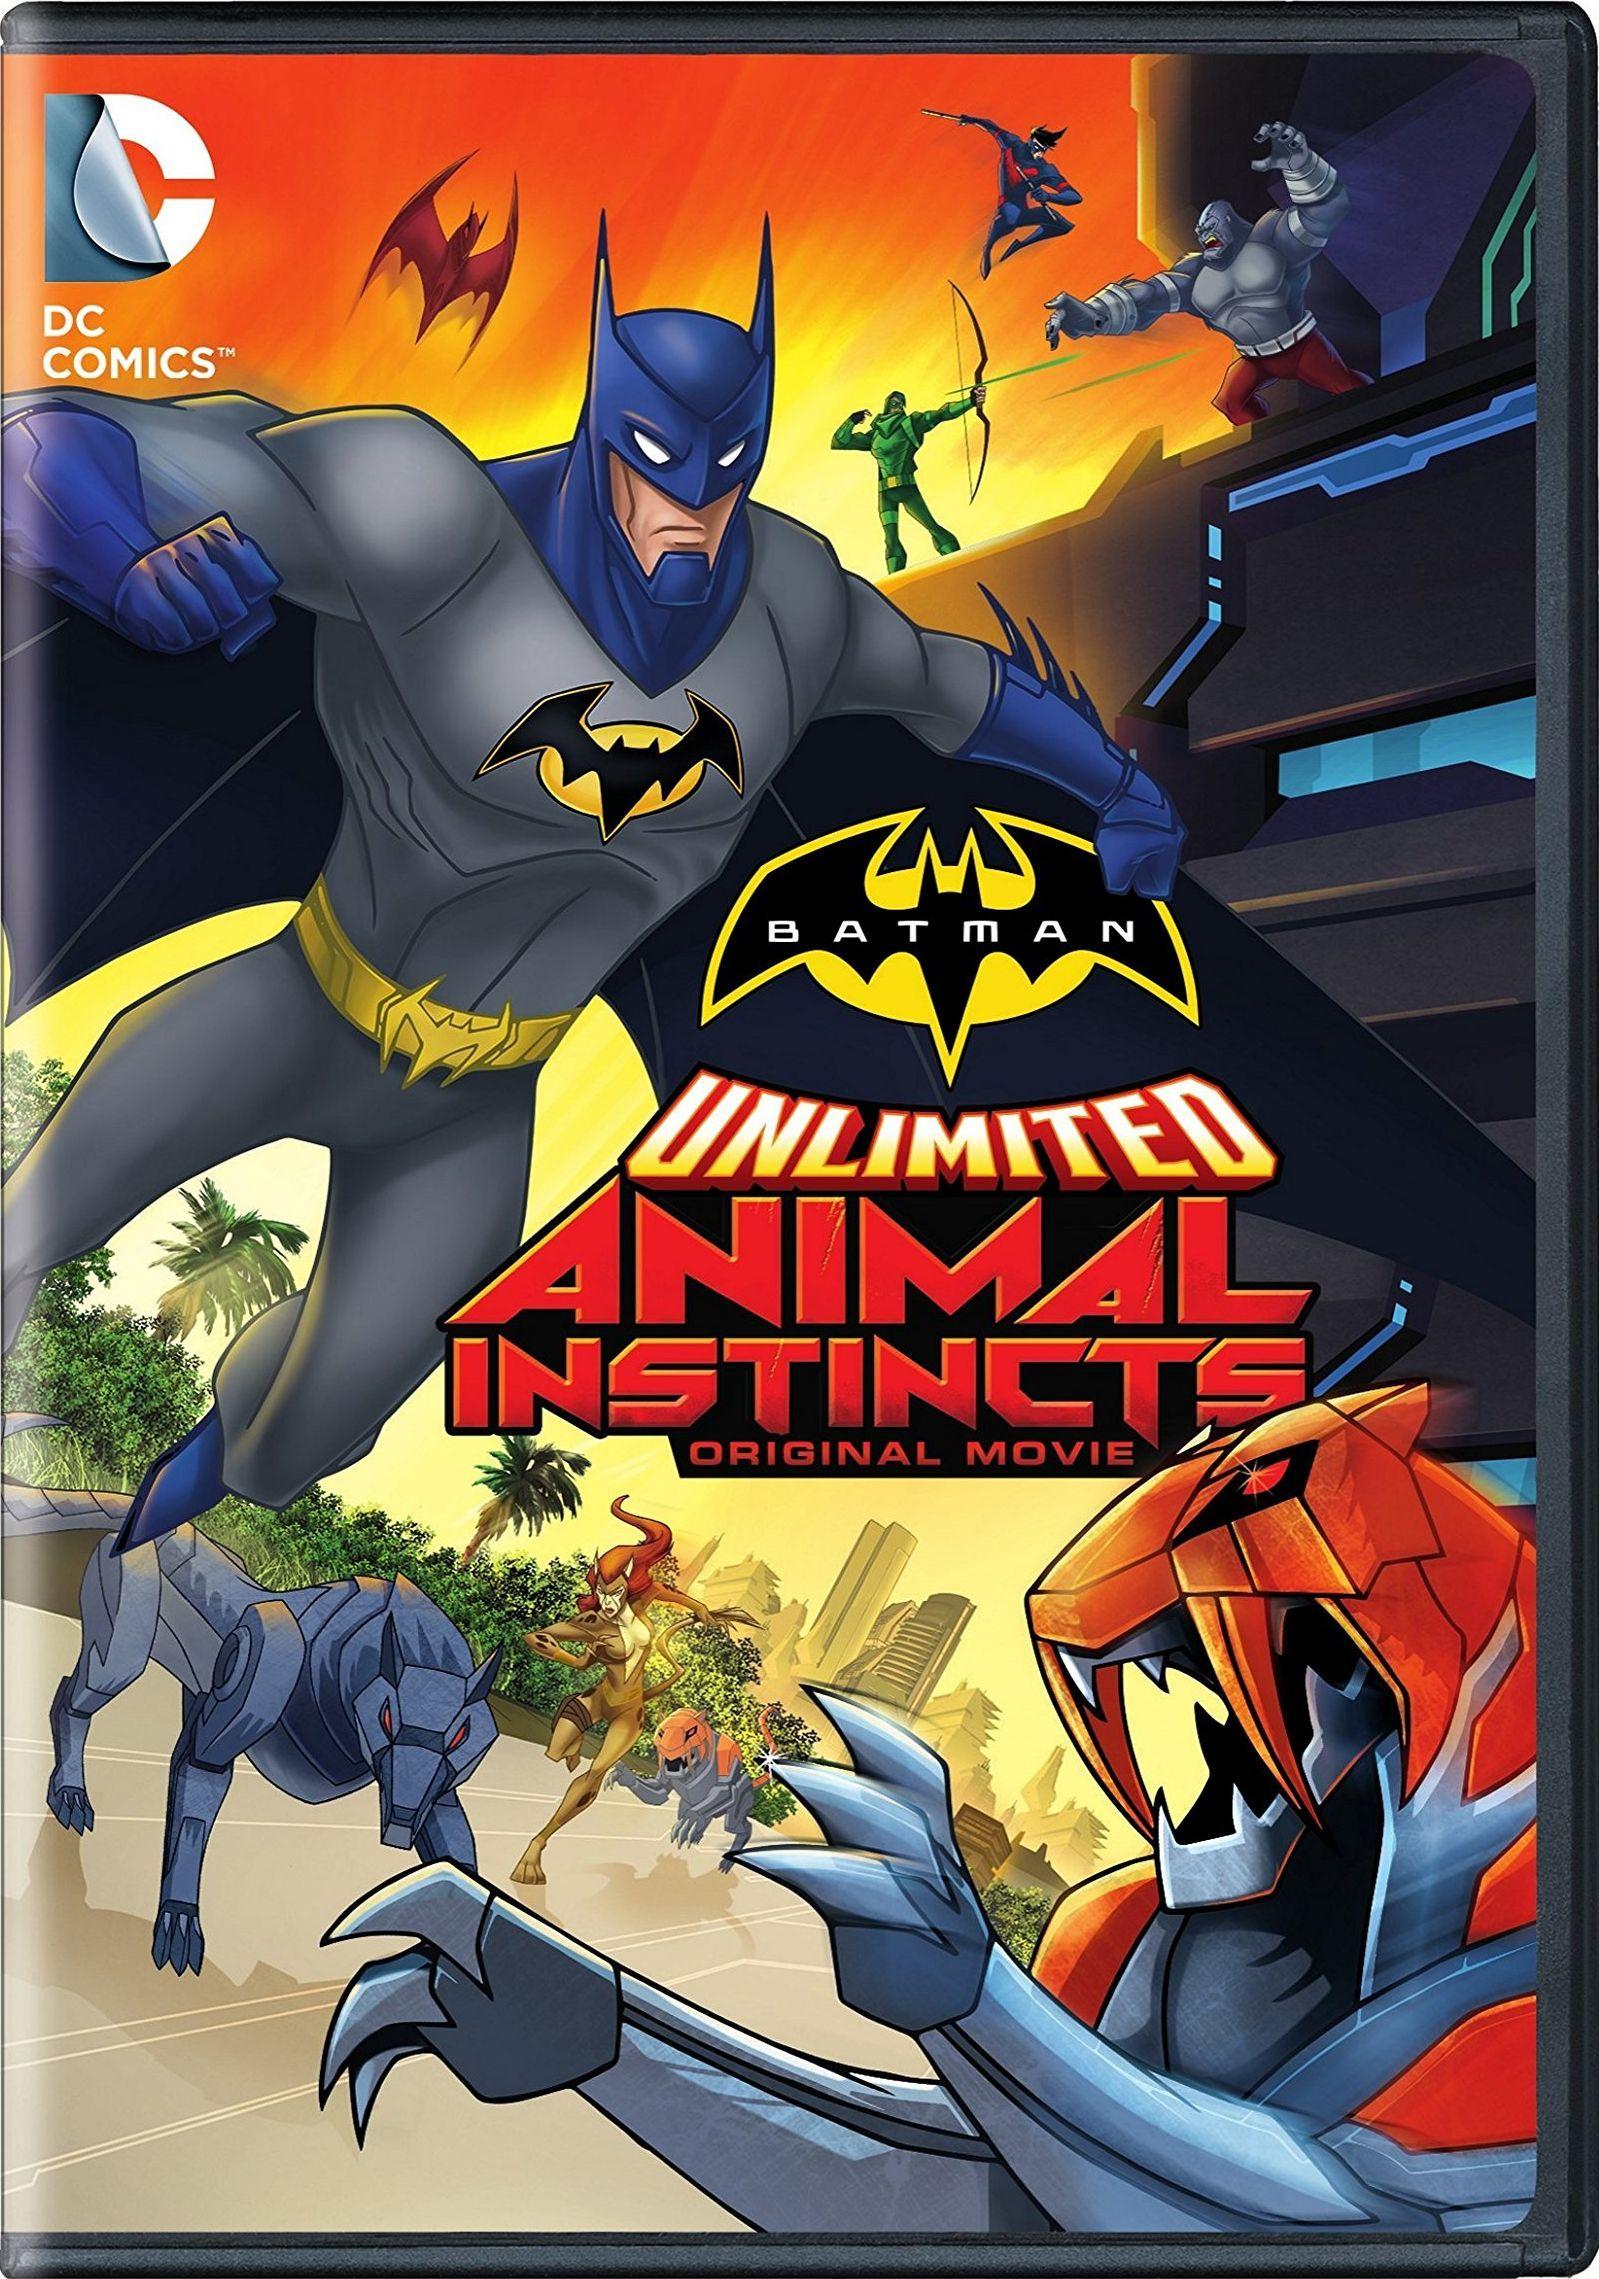 Animal Instincts 1992 Movie batman unlimited: animal instincts | instinct movie, batman